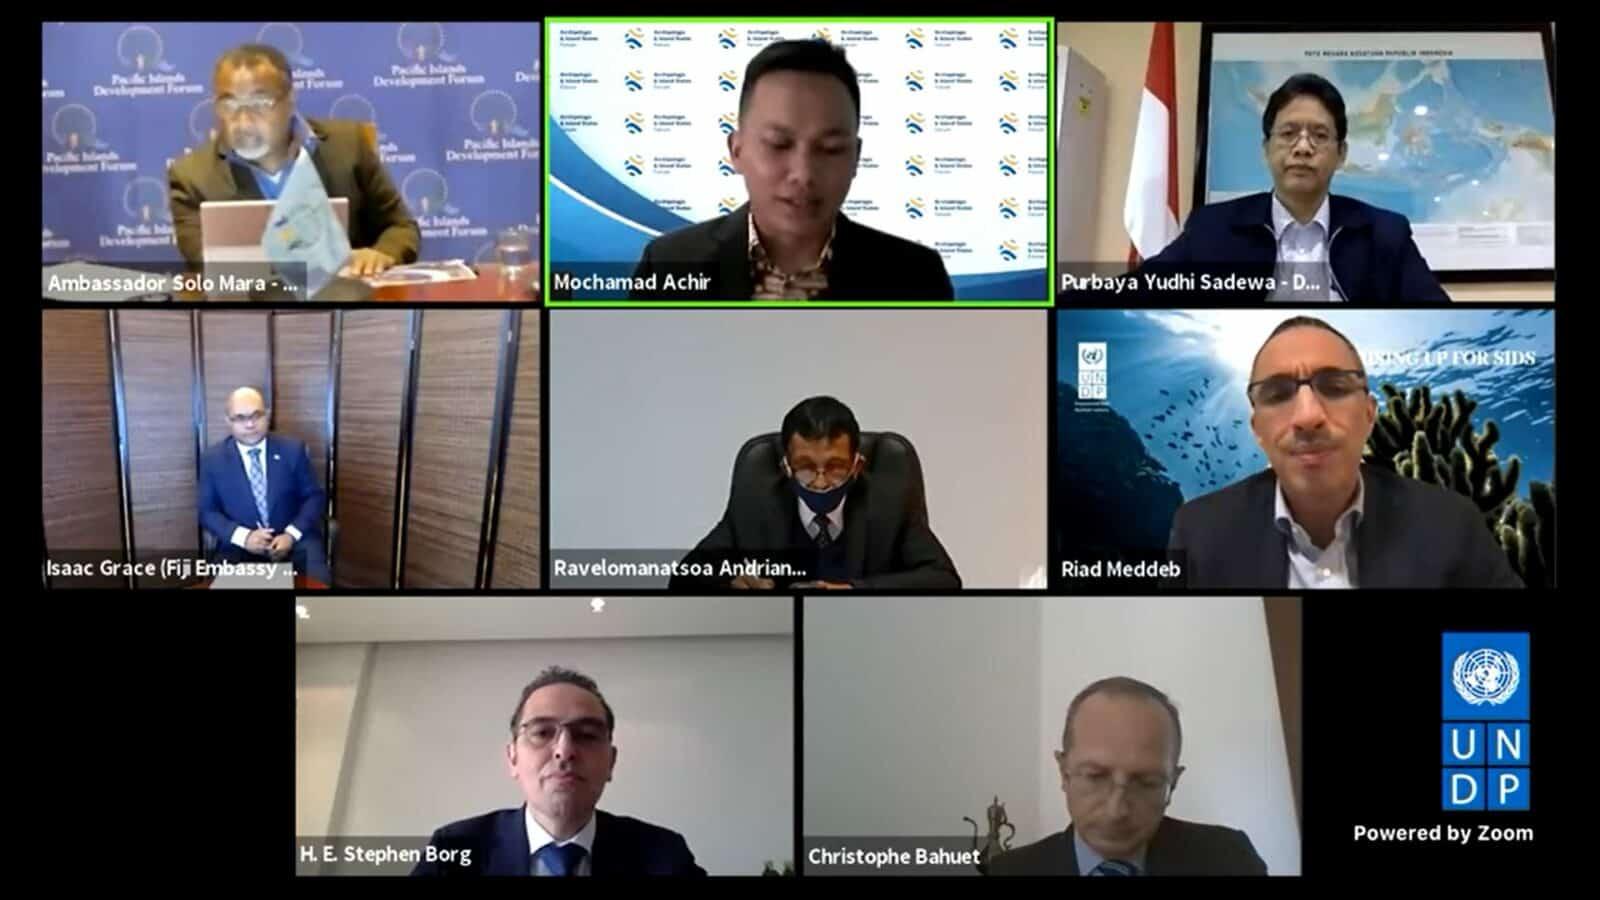 Kemenko Marves : Negara Anggota AIS Harus Bersatu Hadapi Kemunduran Ekonomi Dunia